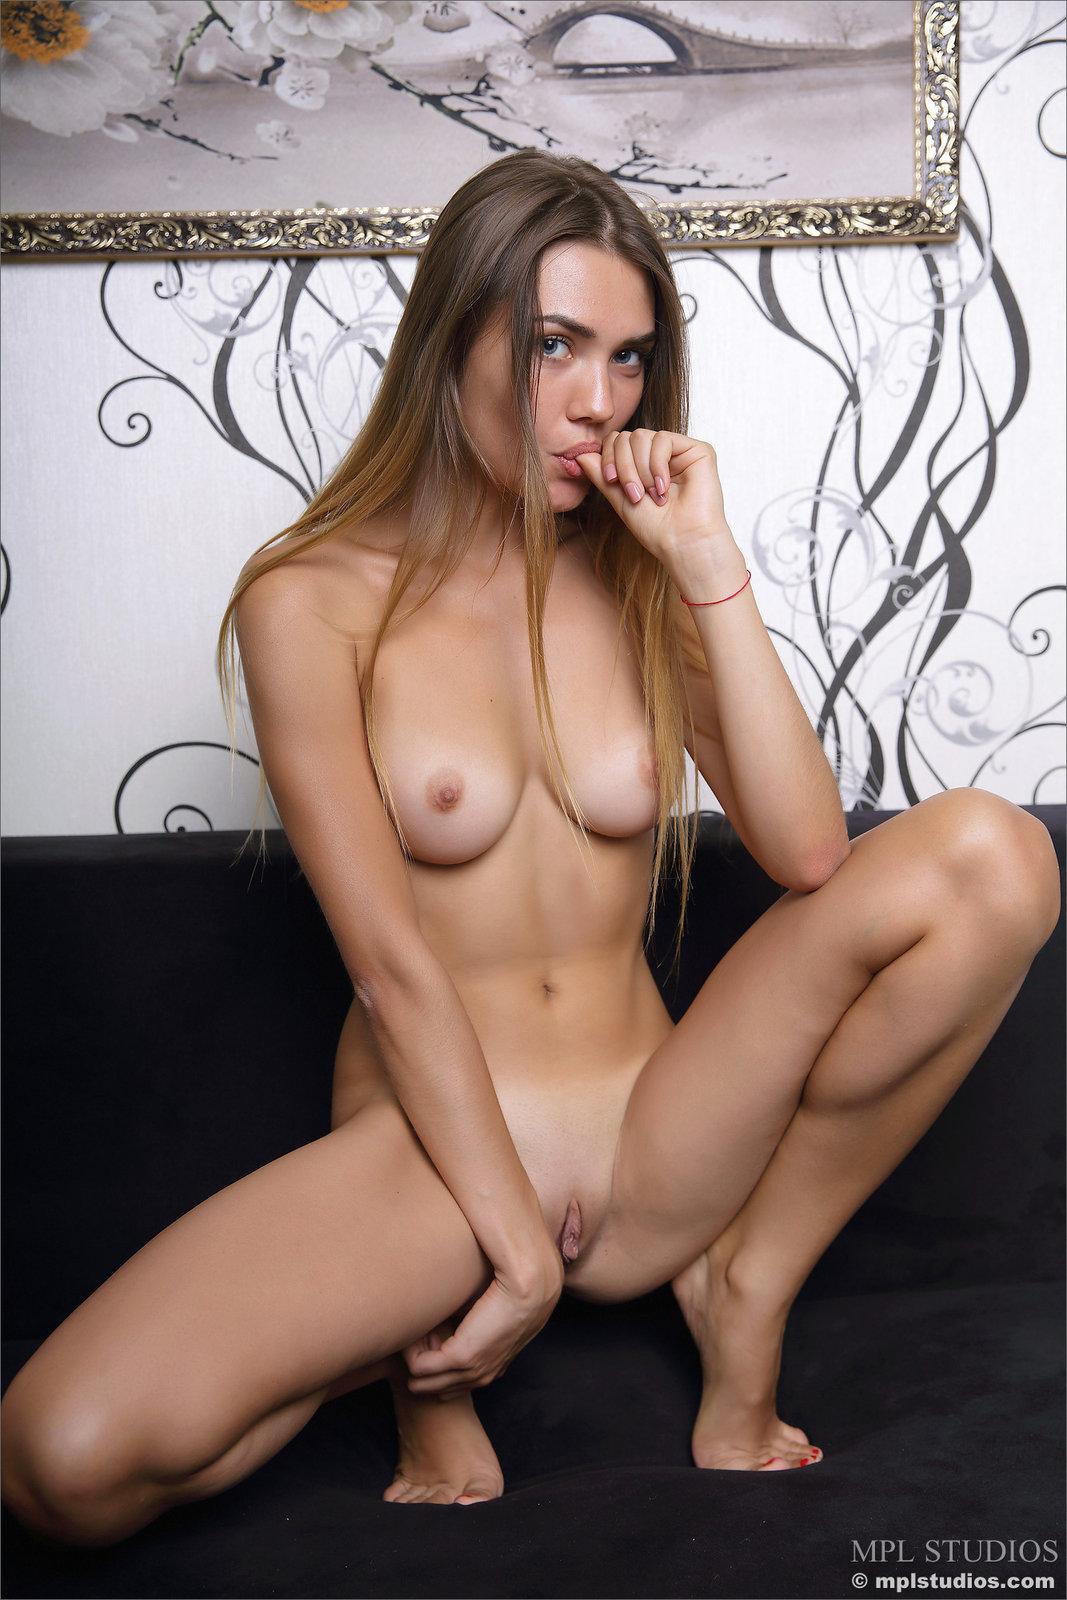 Viva in Sexuality by MPL Studios (12 photos) | Erotic Beauties